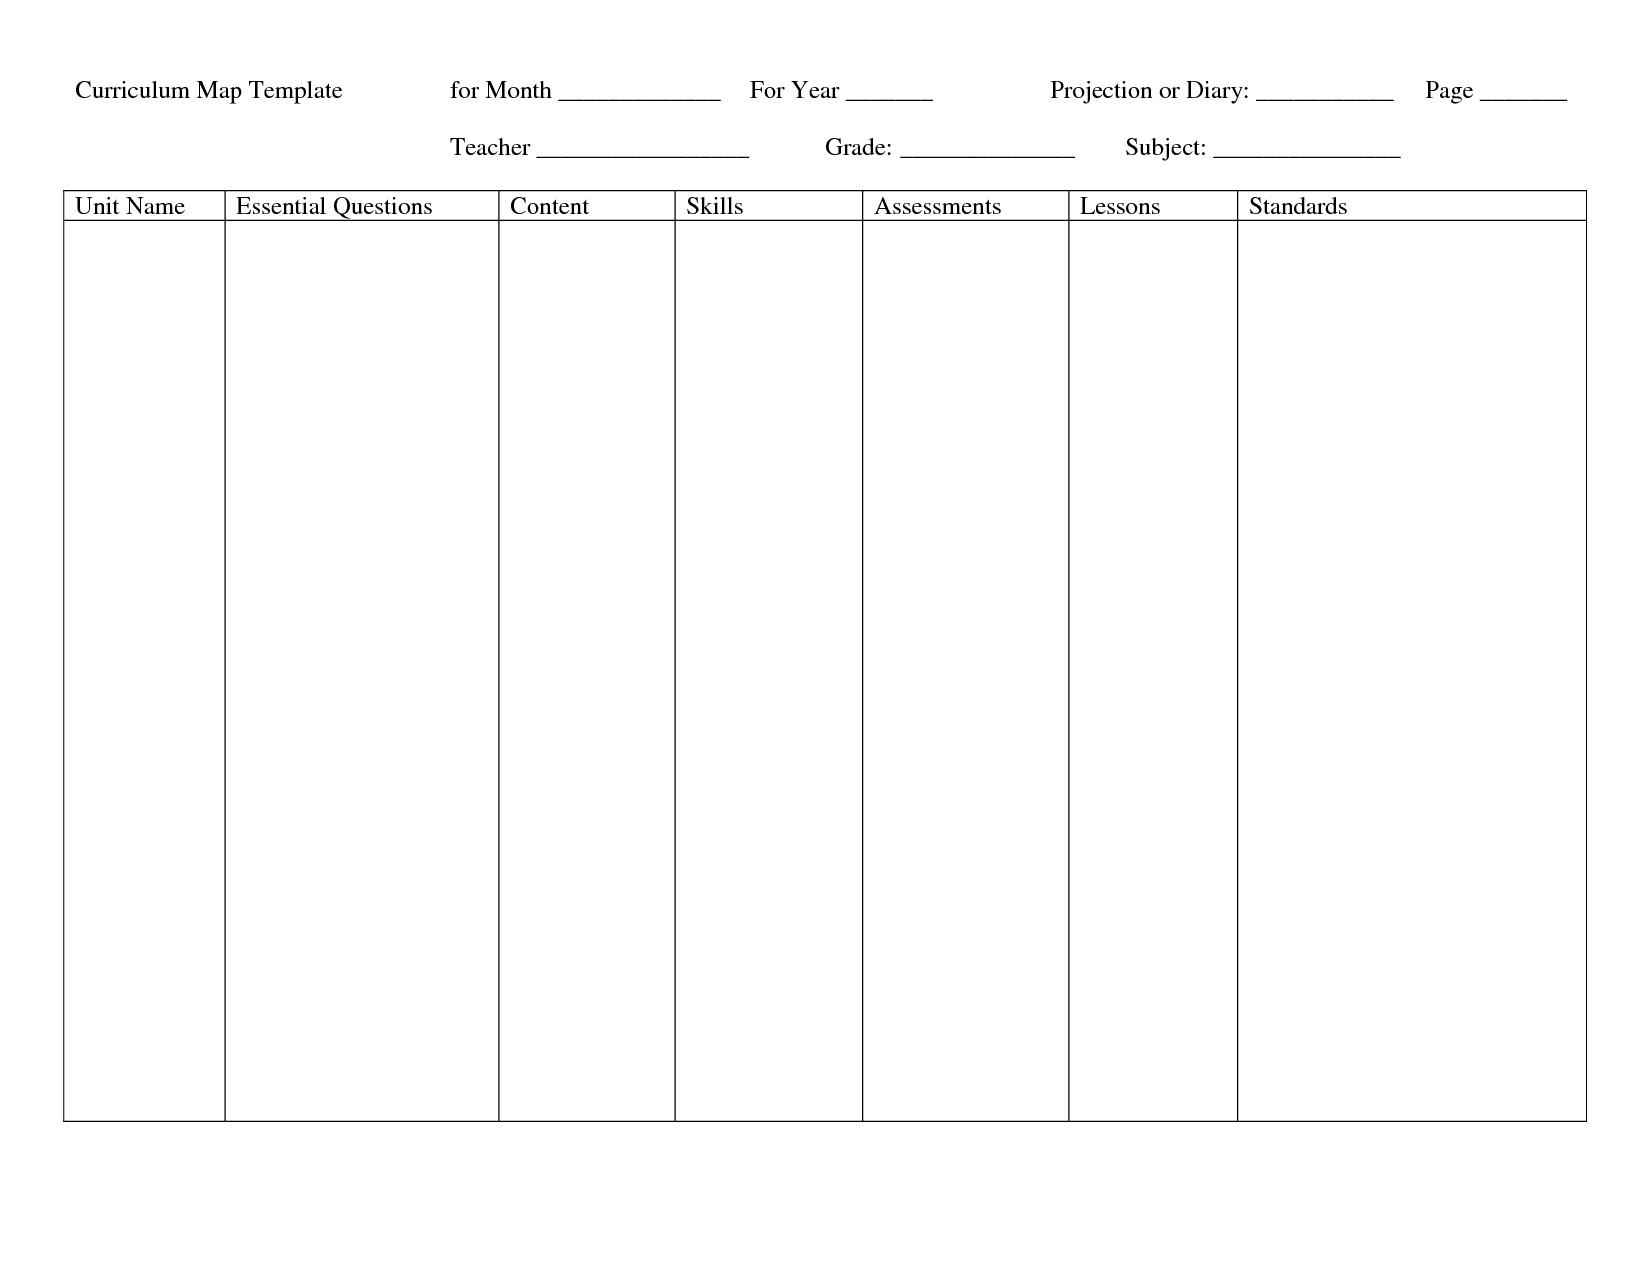 Monthly Curriculum Map Template  Curriculum Map Template  Download Regarding Blank Curriculum Map Template